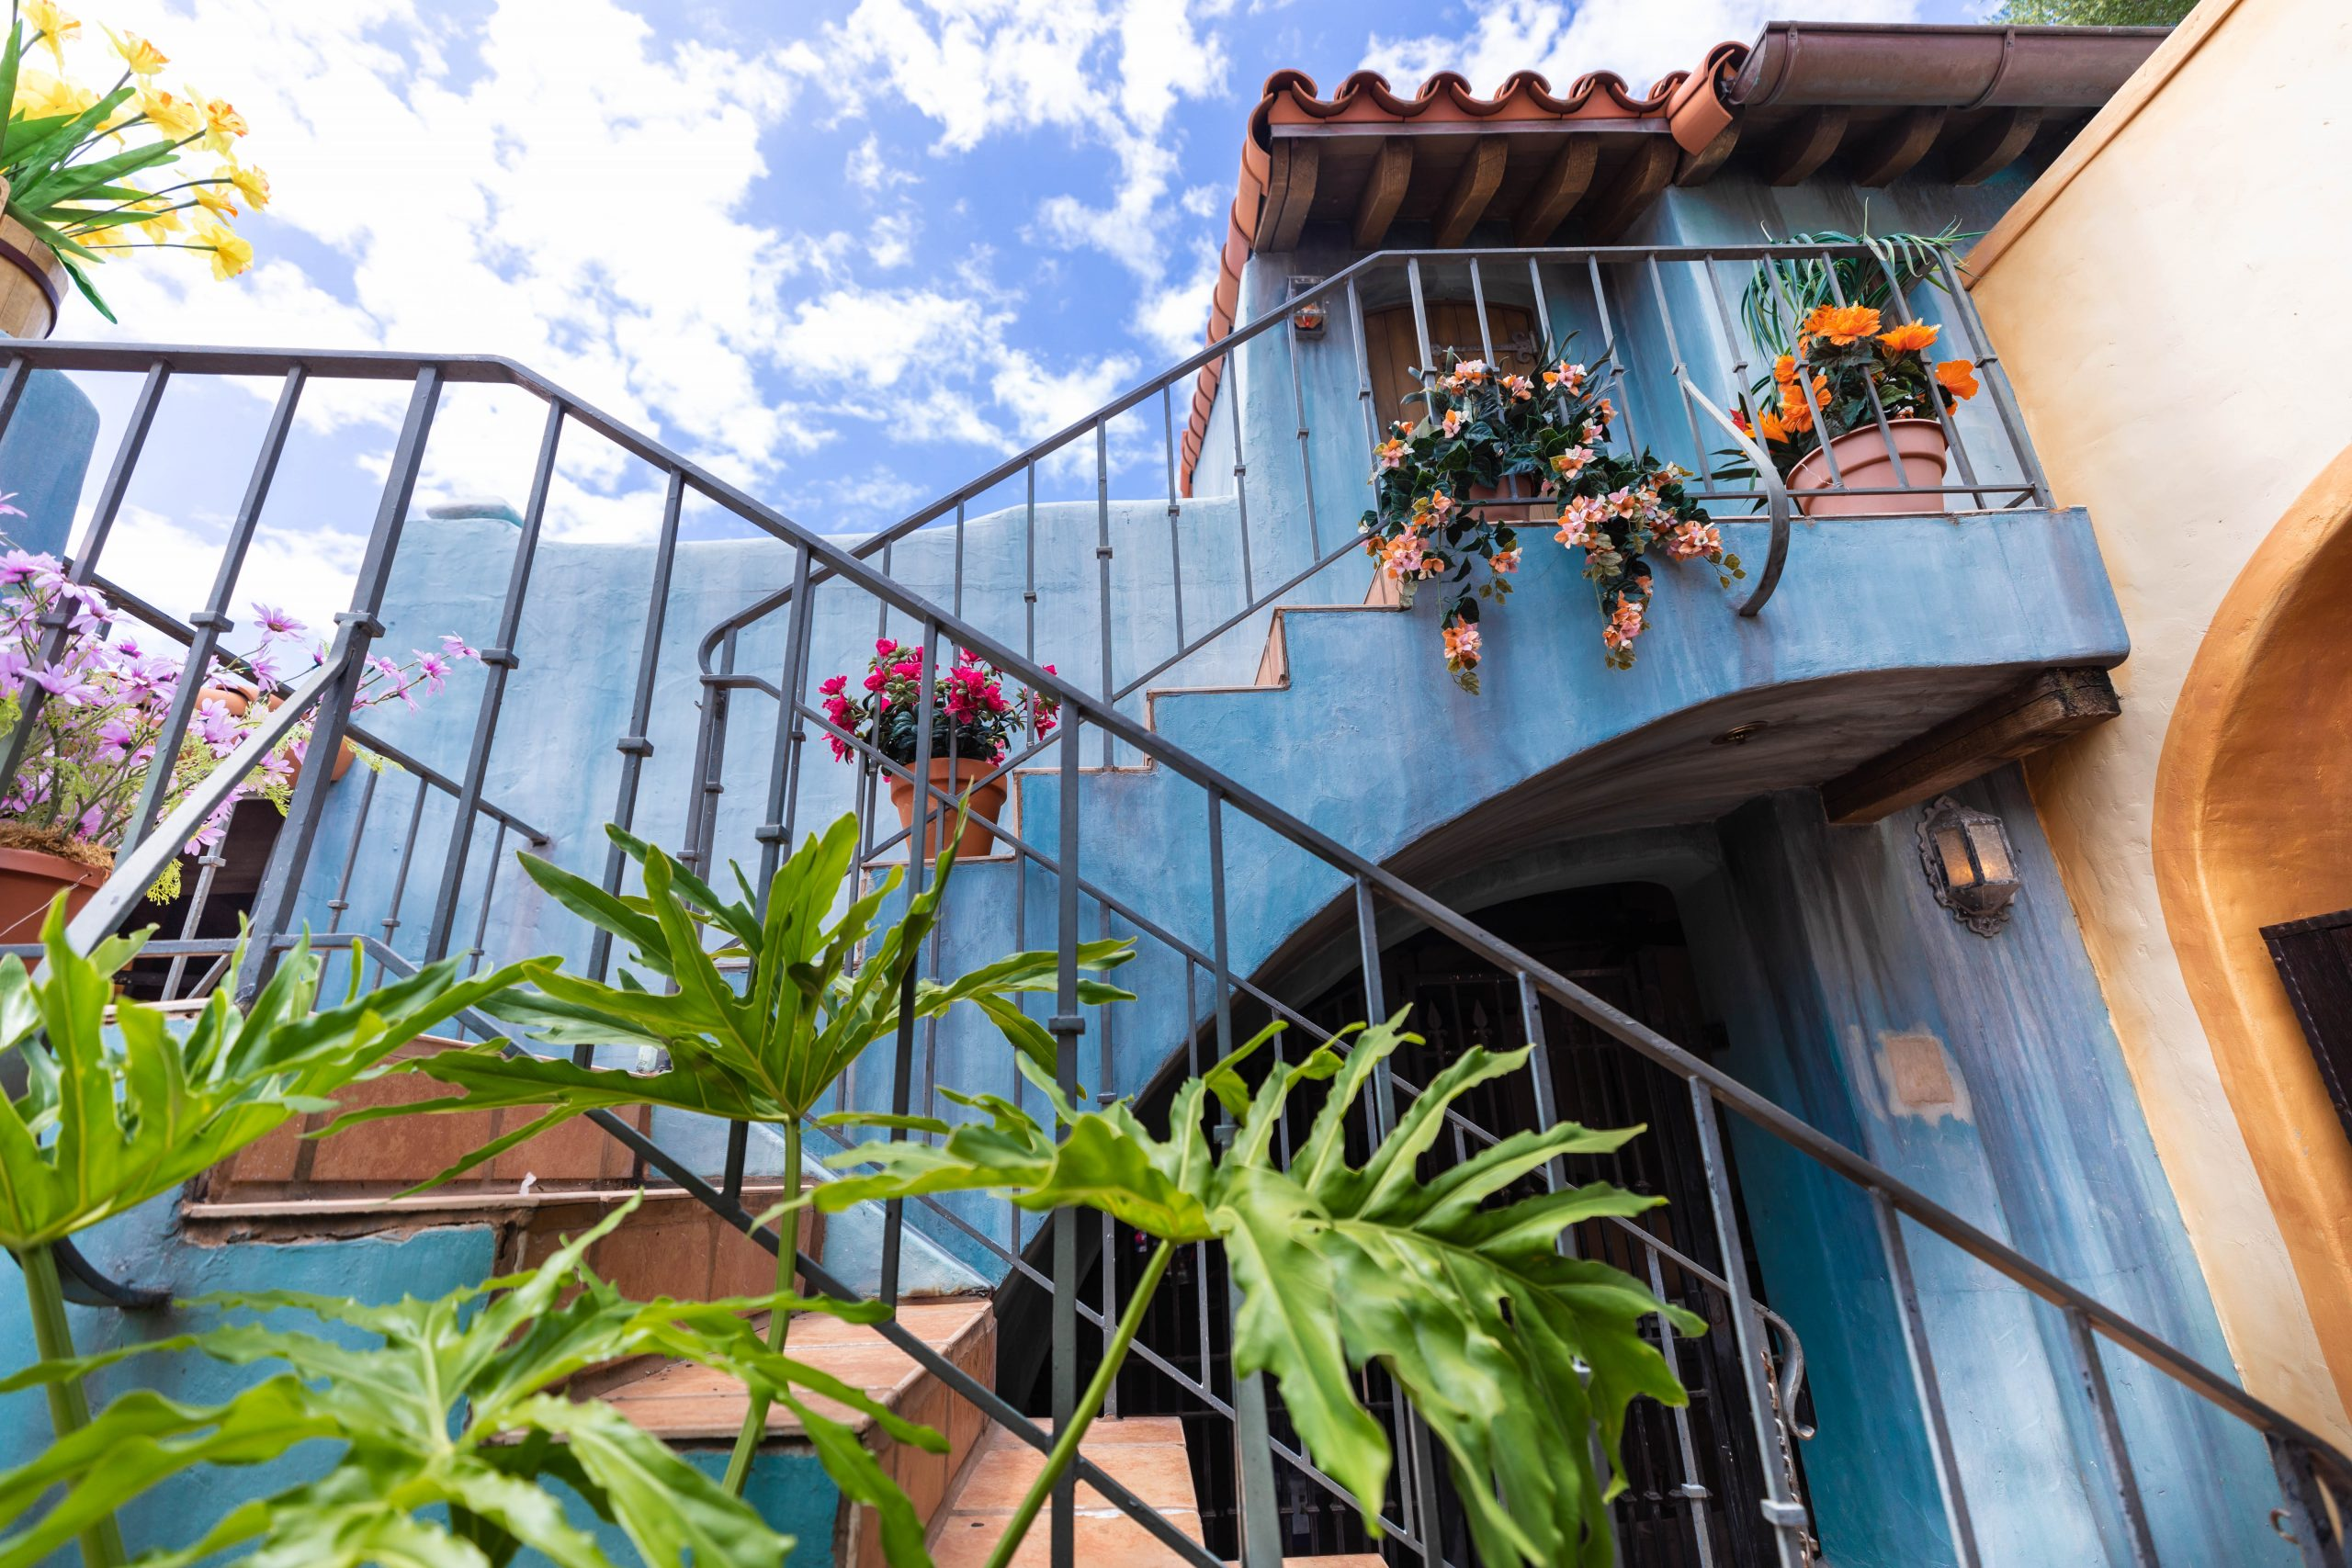 Blue Building Near Pirates of the Caribbean Ride at Magic Kingdom Walt Disney World in Orlando Florida Photographed by Luxury Travel Writer Annie Fairfax